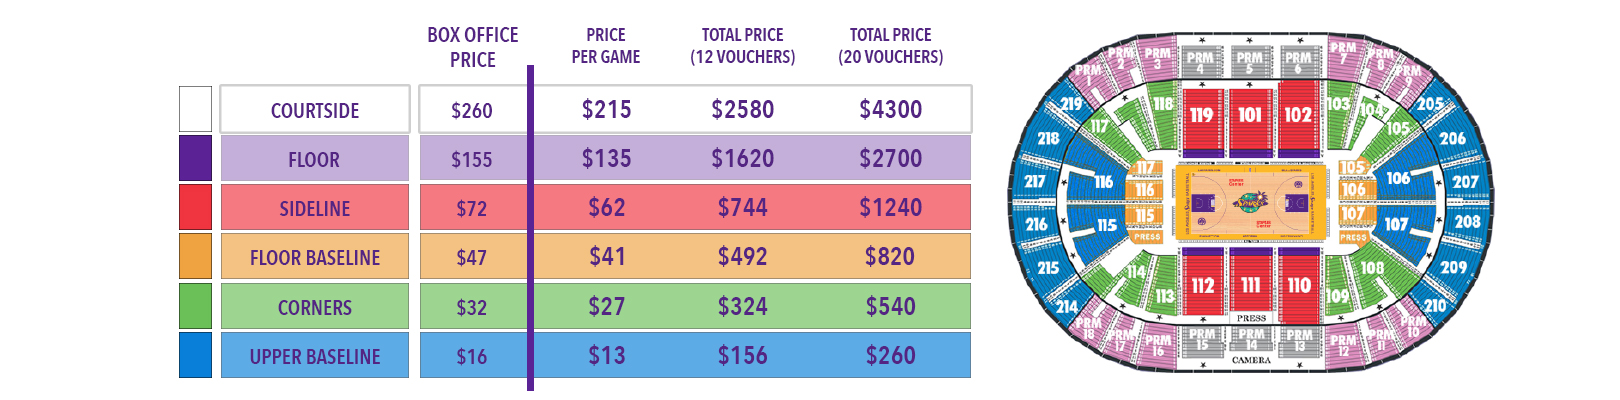 Flex_Pricing